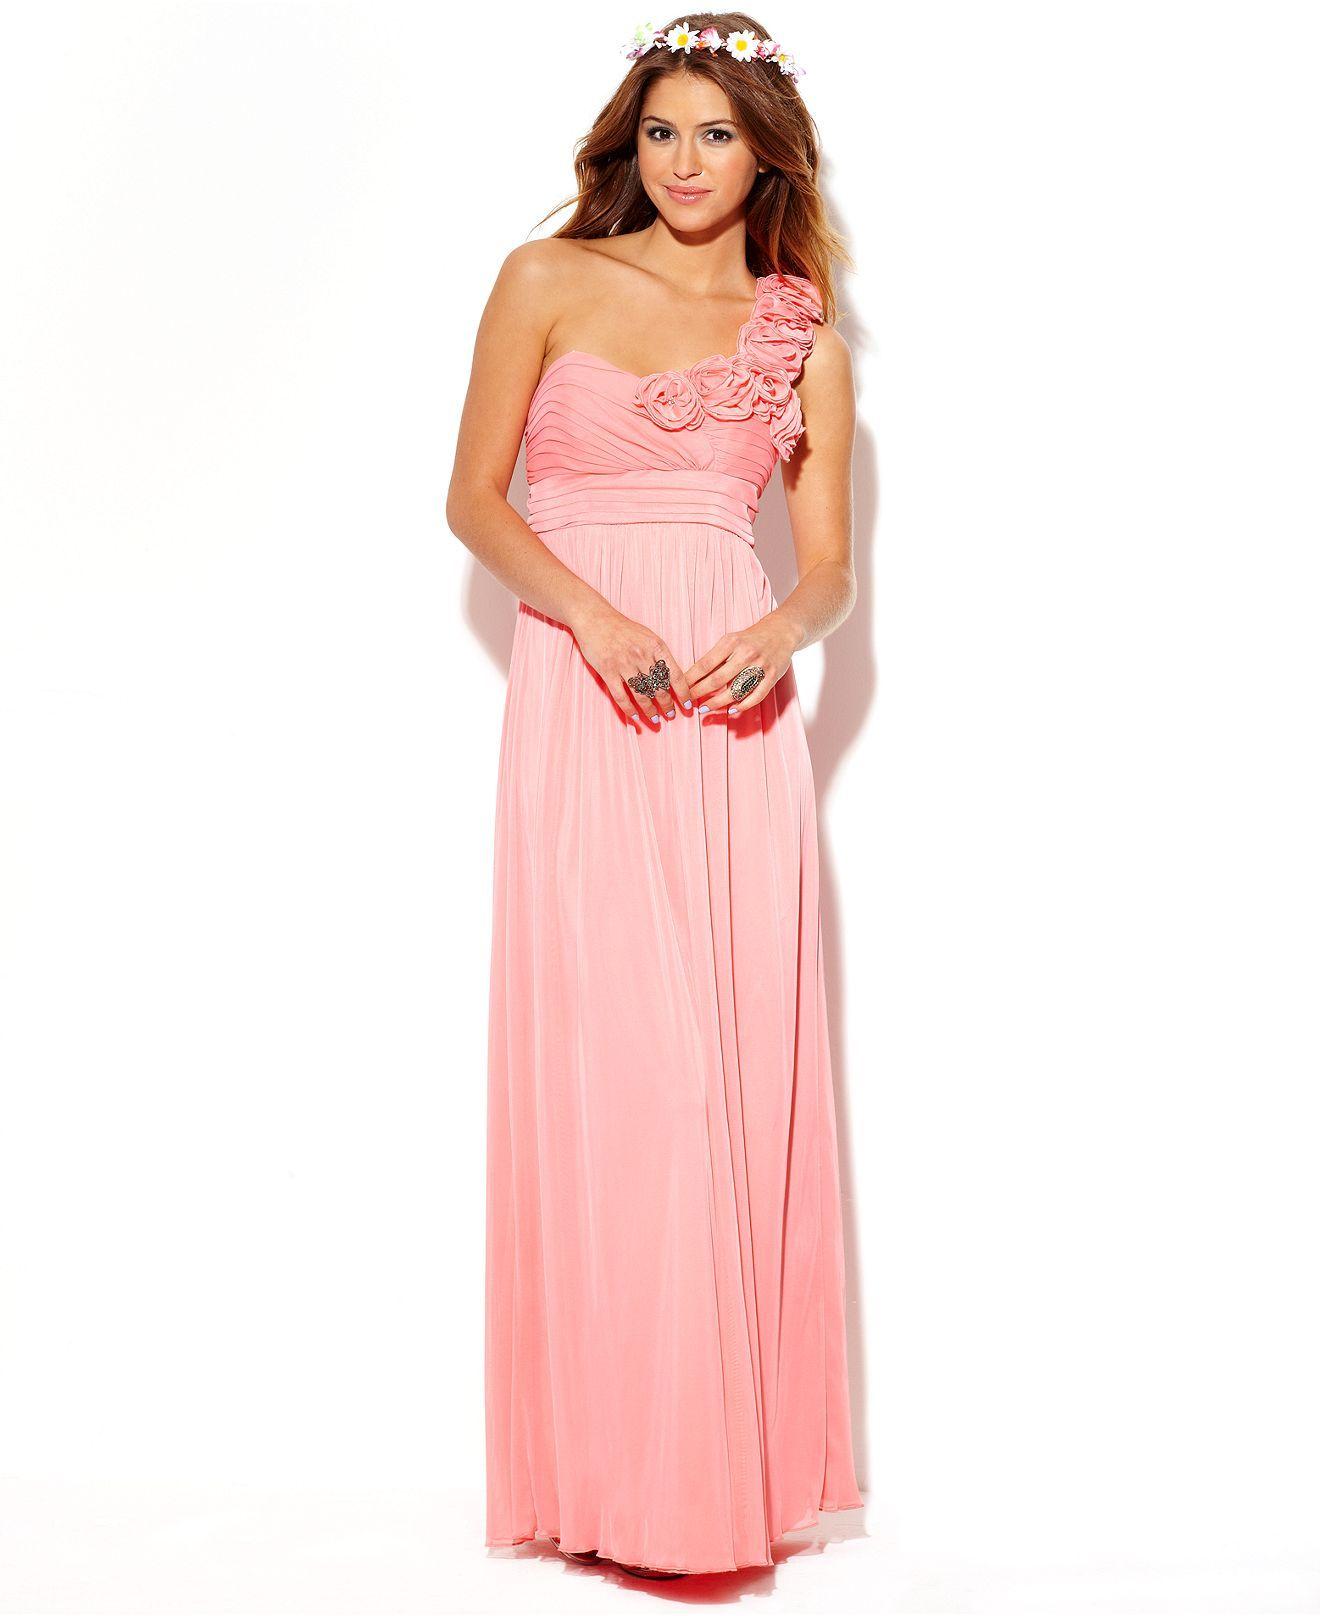 City Studios Juniors Dress, Sleeveless Pleated Rosette Gown - Juniors Dresses - Macys $89.00